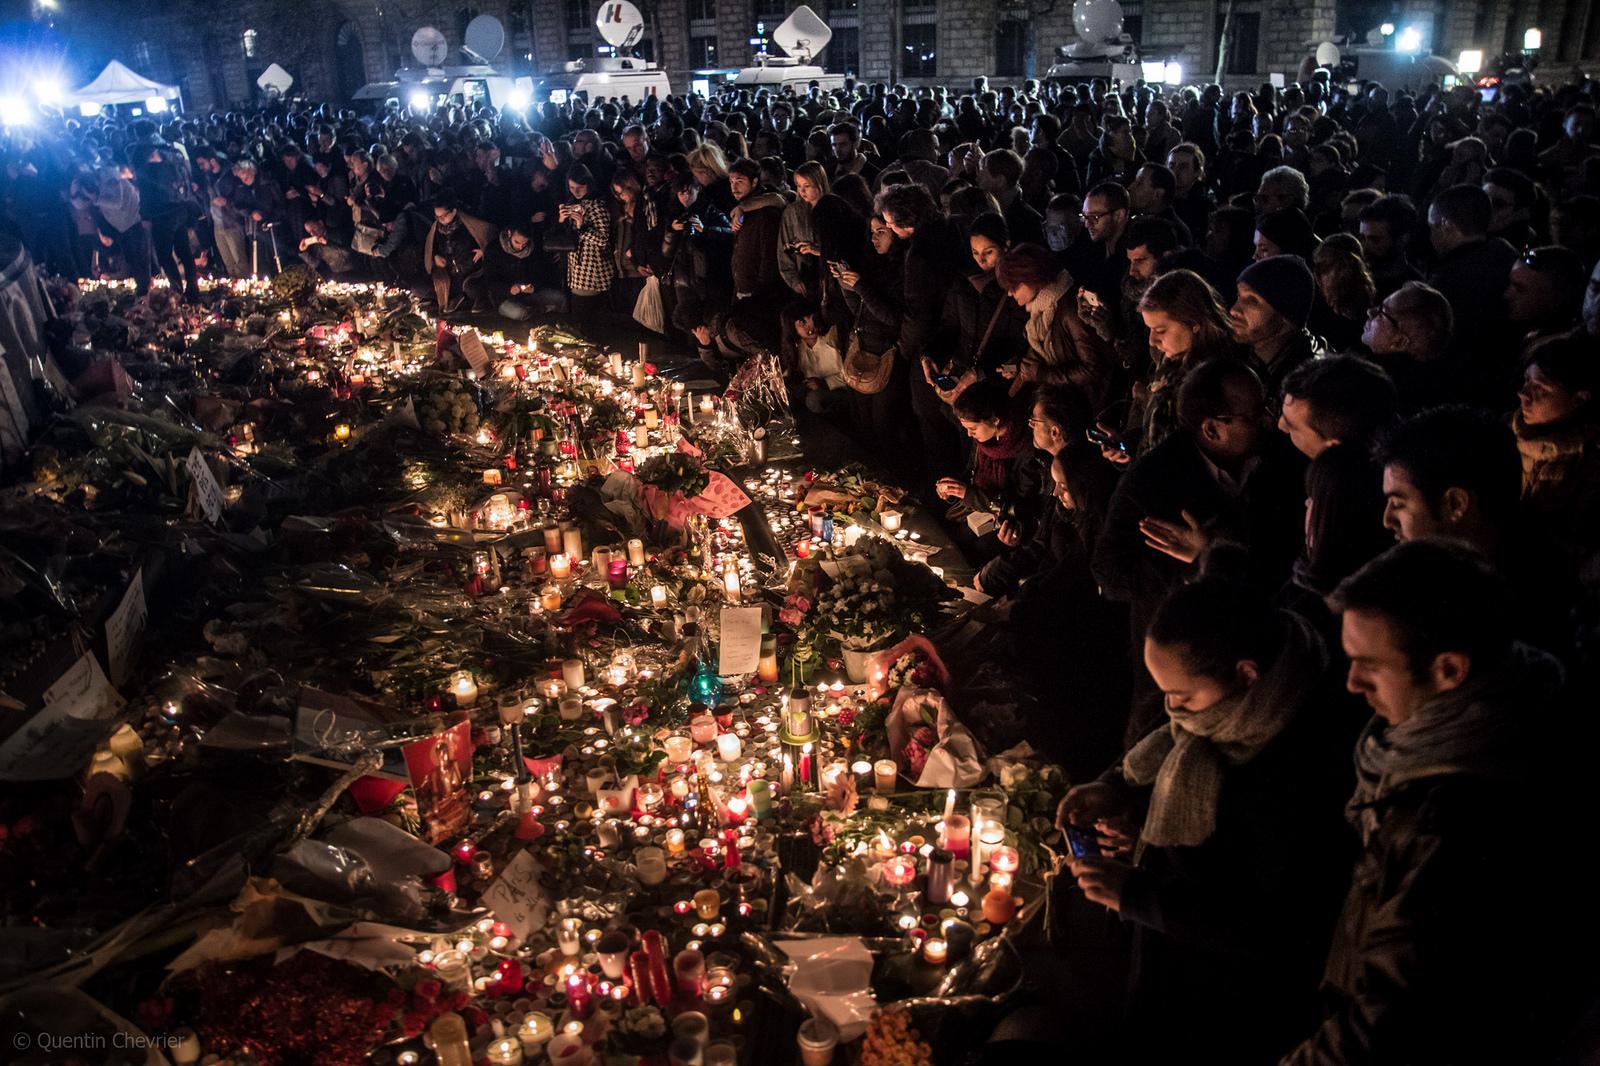 15. november 2015: Folk samles på Place de la République i Paris for å minnes ofrene i terrorangrepet to dager tidligere.